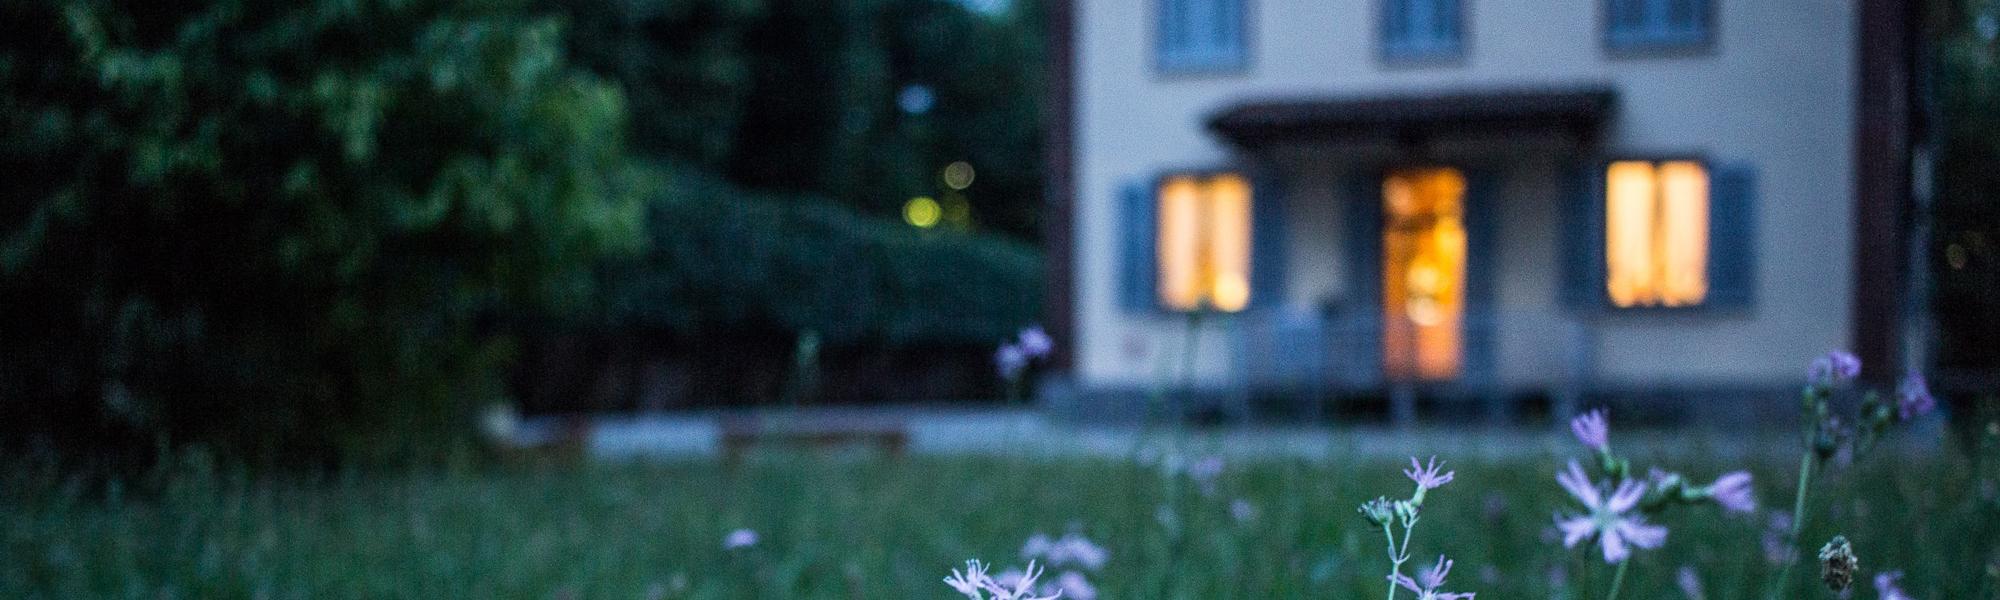 House at dusk with lights at the wondows. Photo by Valentina Locatelli on Unsplash